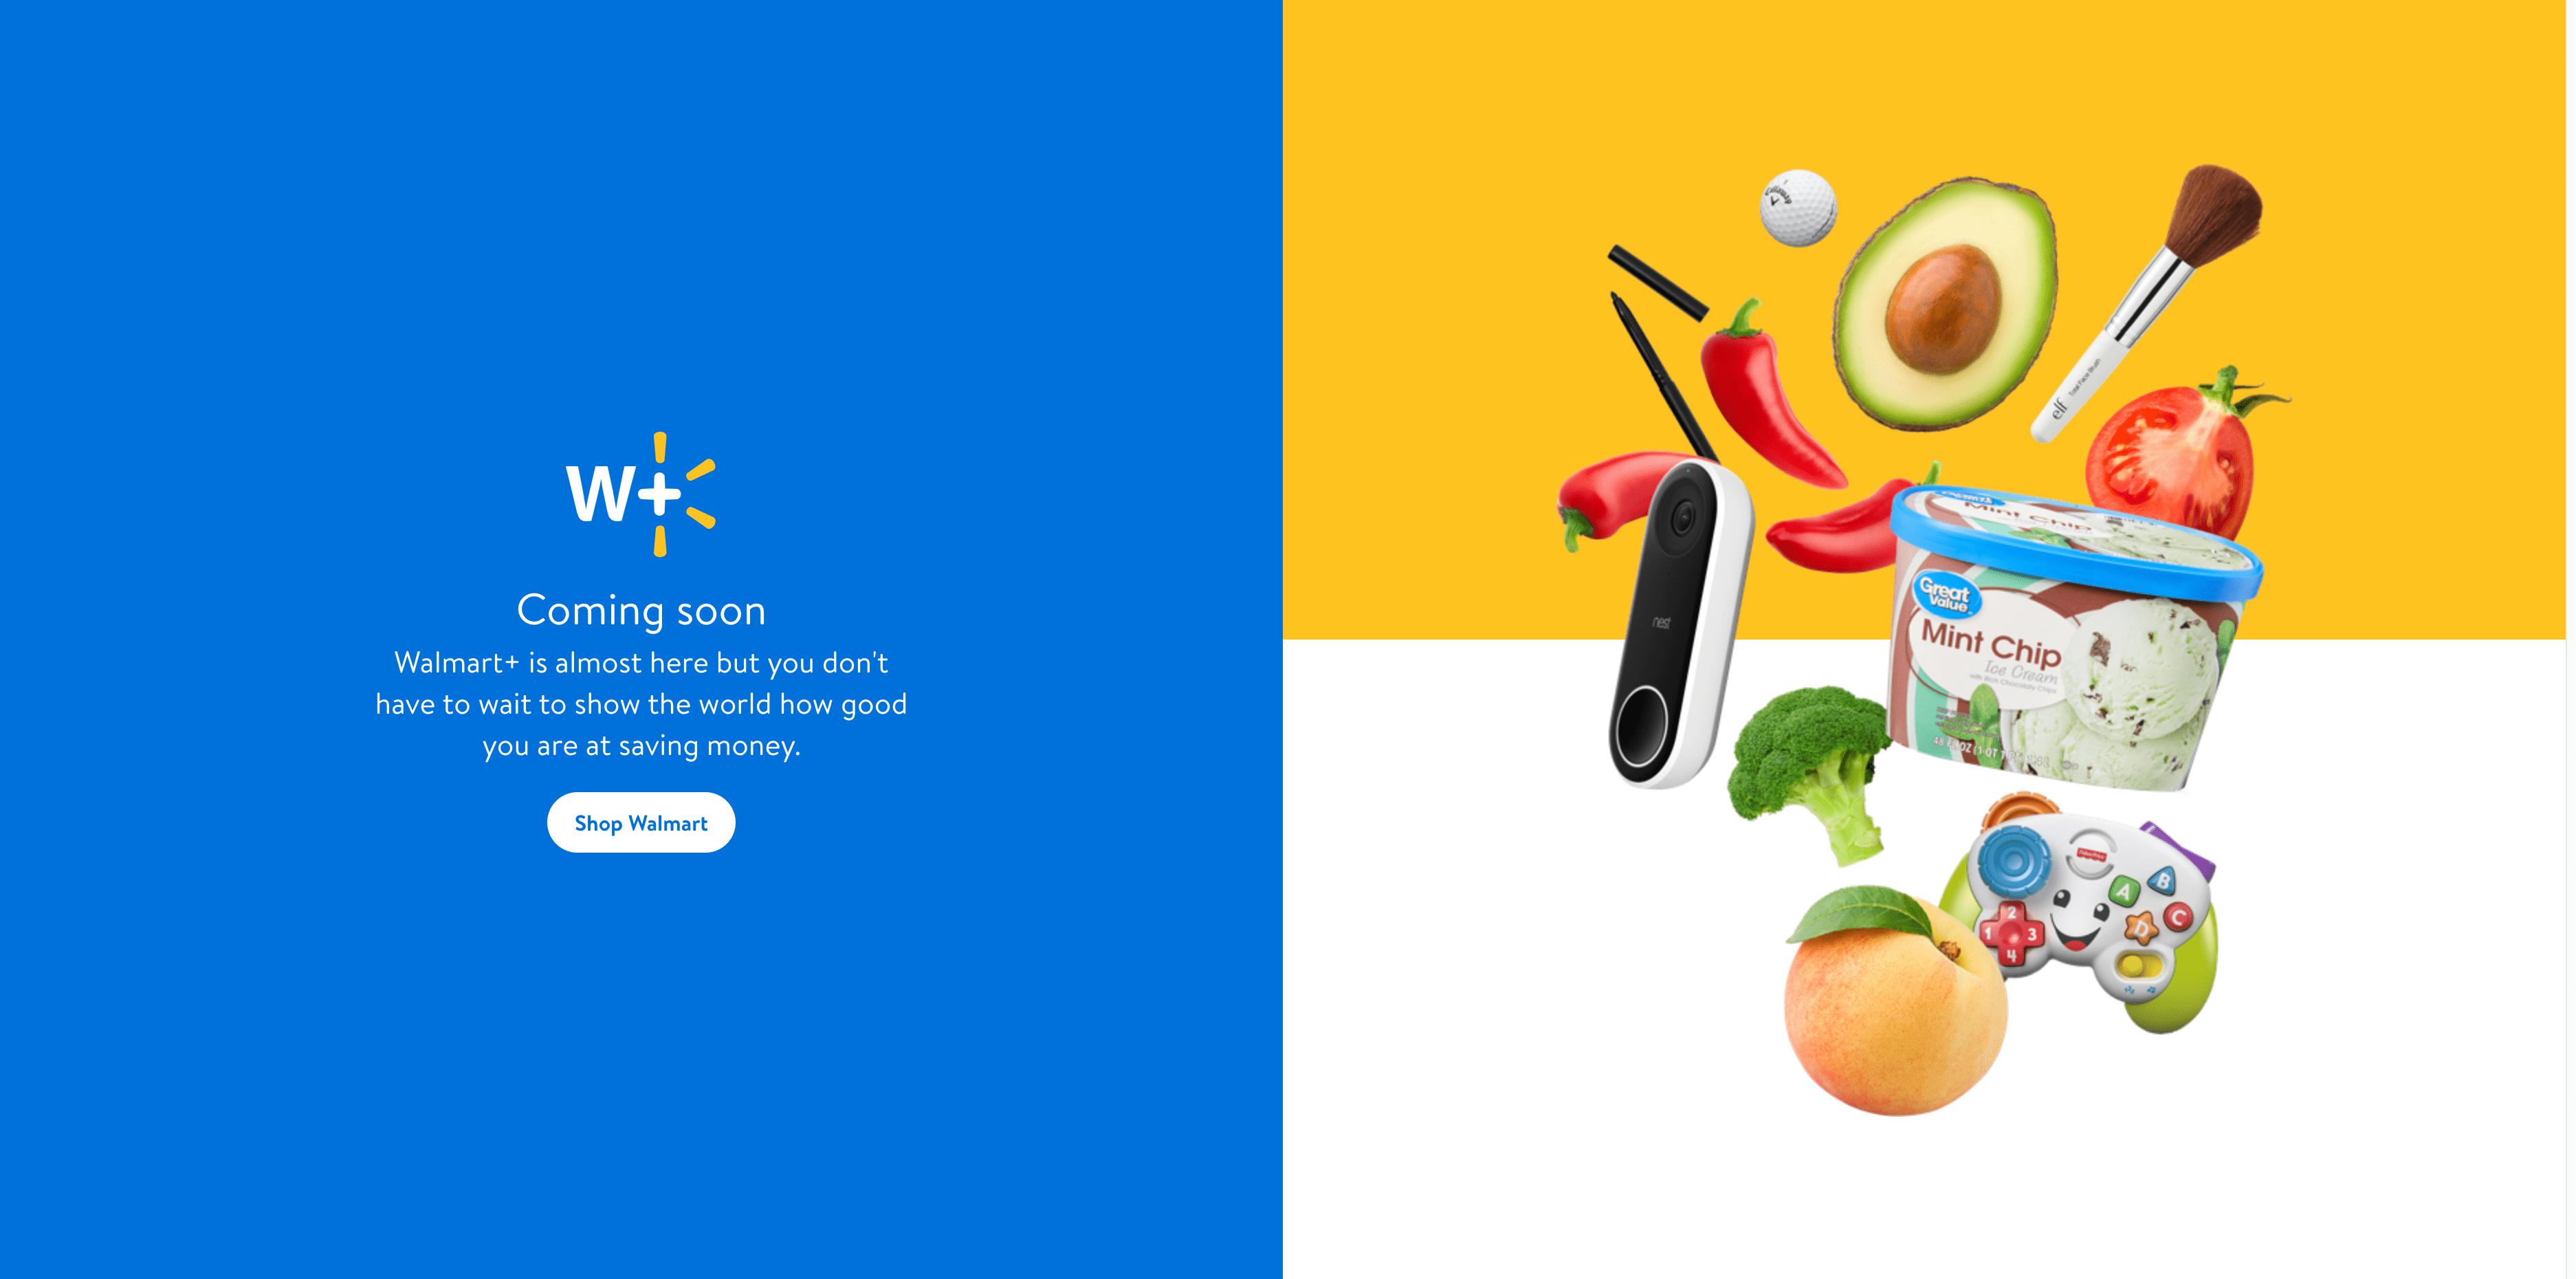 Walmart_Plus_Walmart_Walmart_com